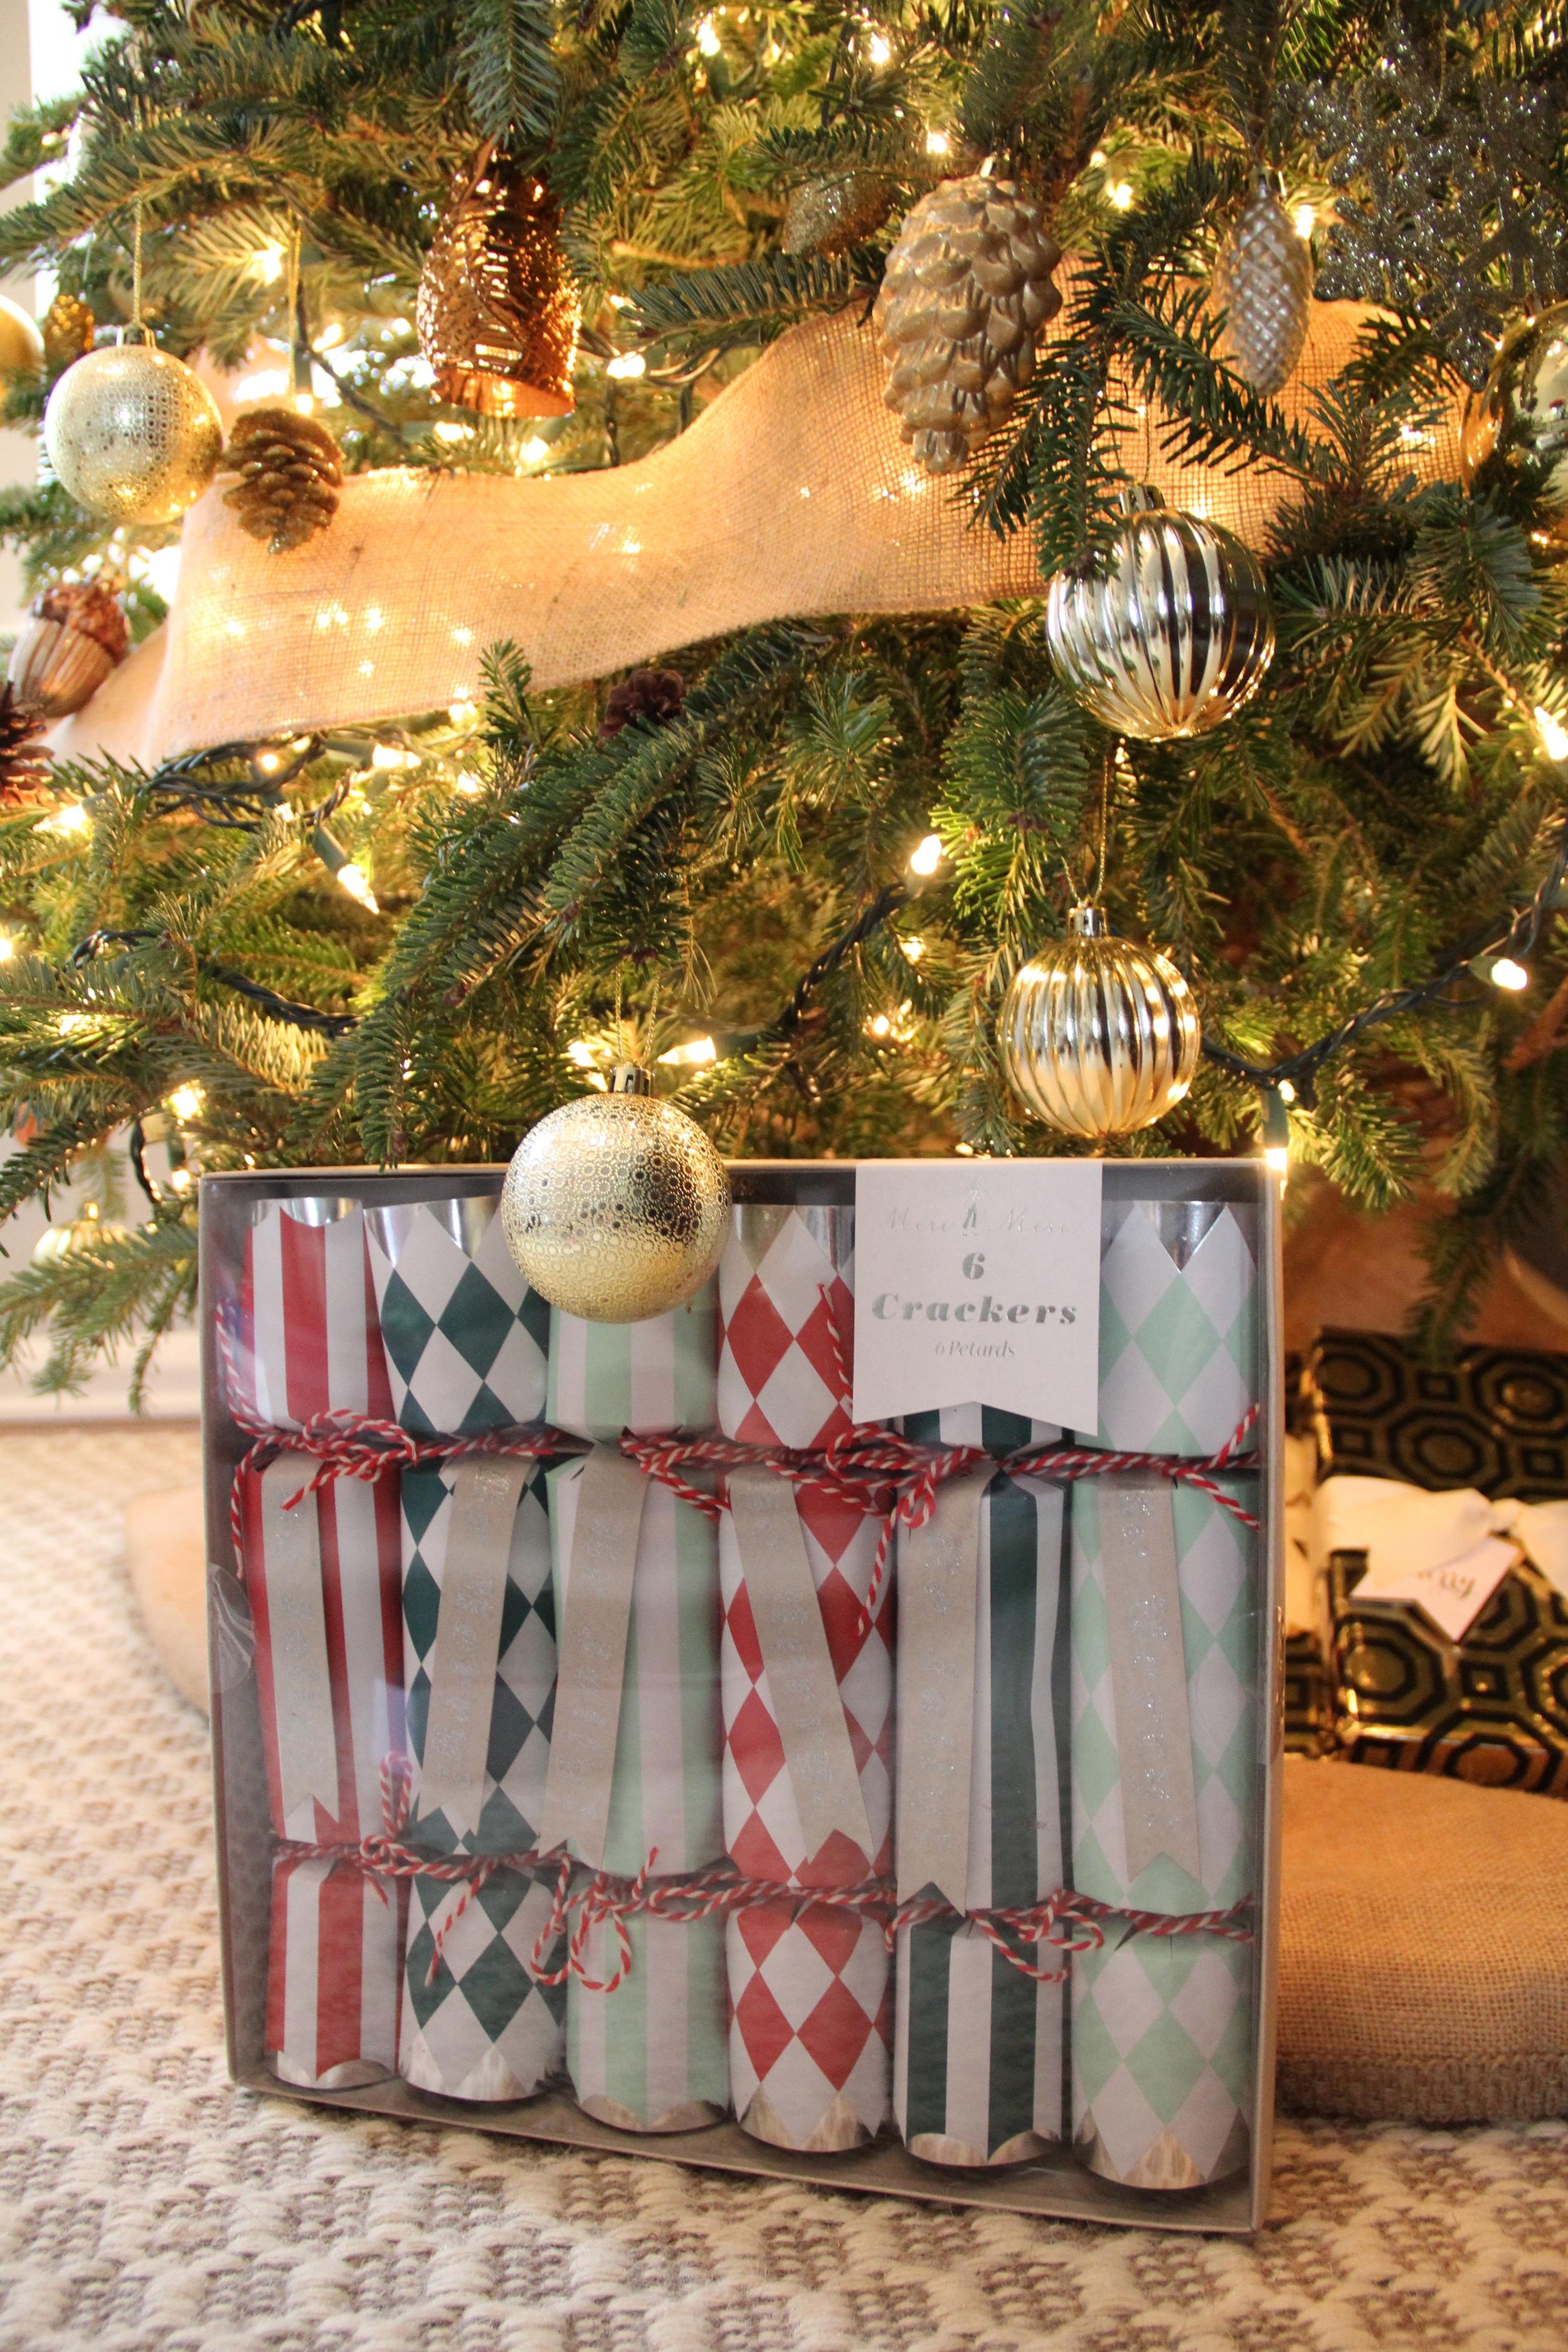 Meri Meri Christmas Crackers Box.jpg